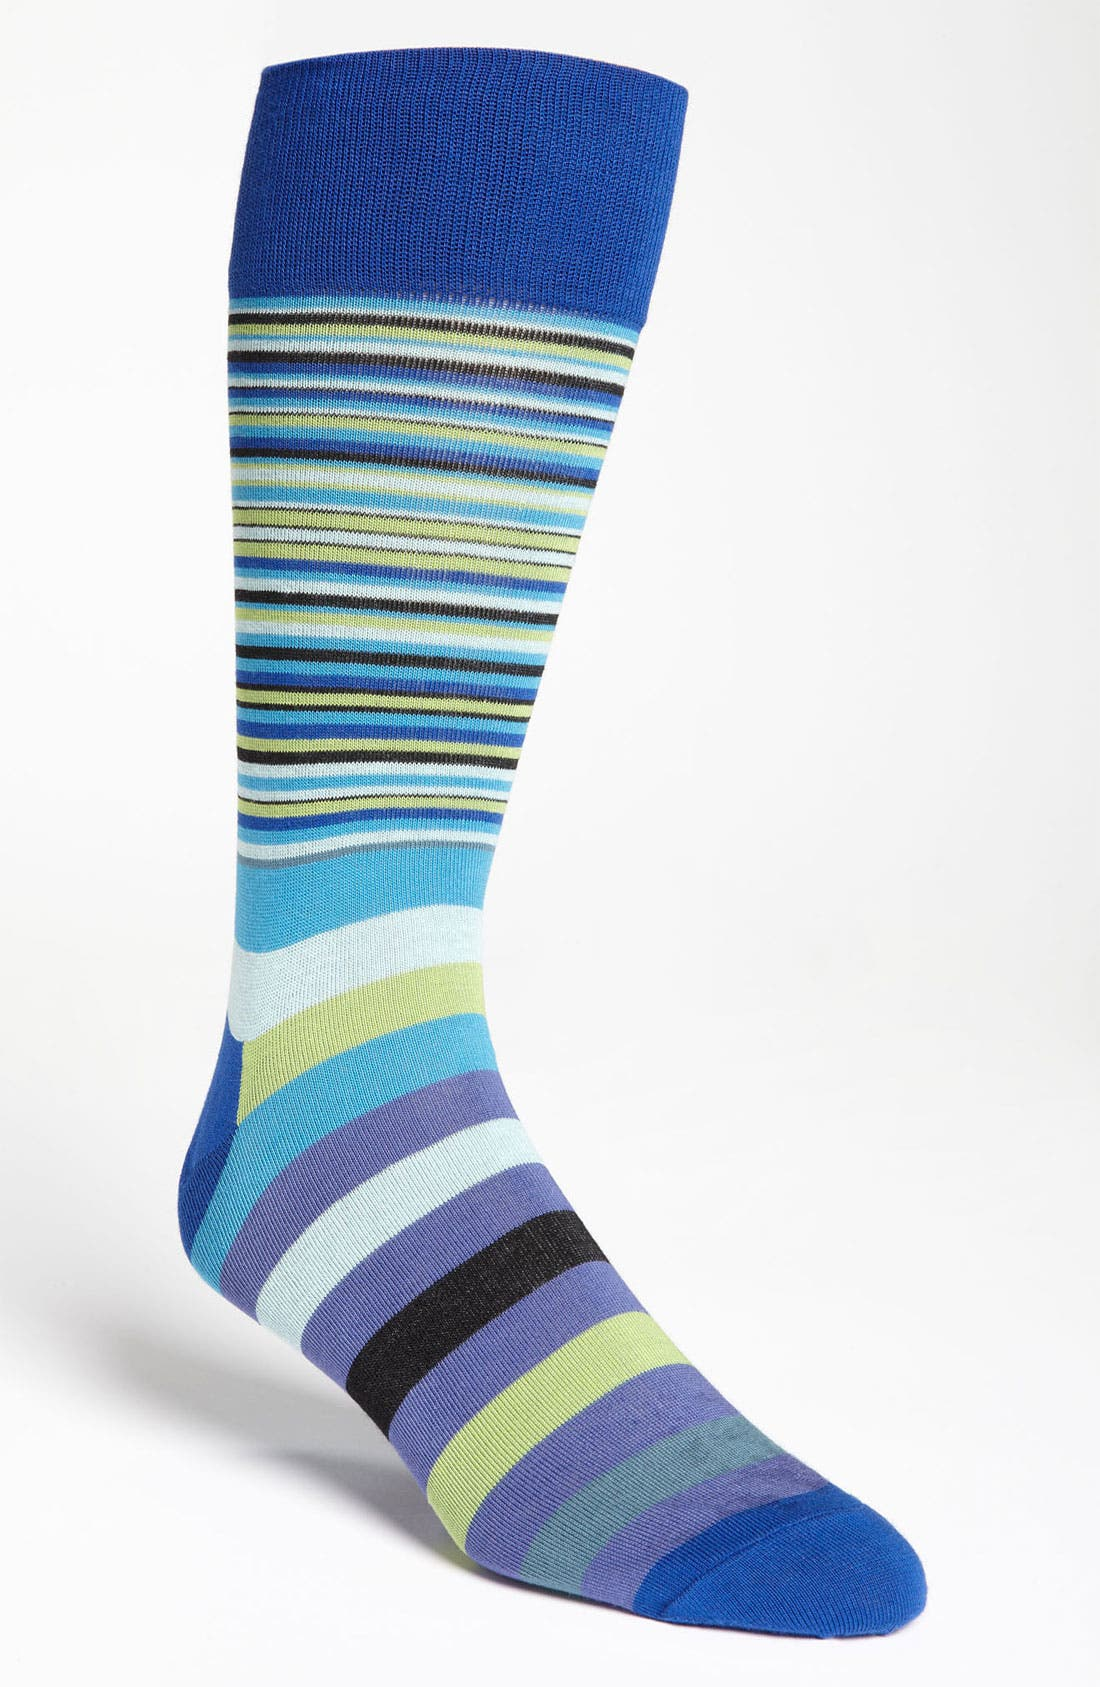 Main Image - Cole Haan 'Town Stripe' Crew Socks